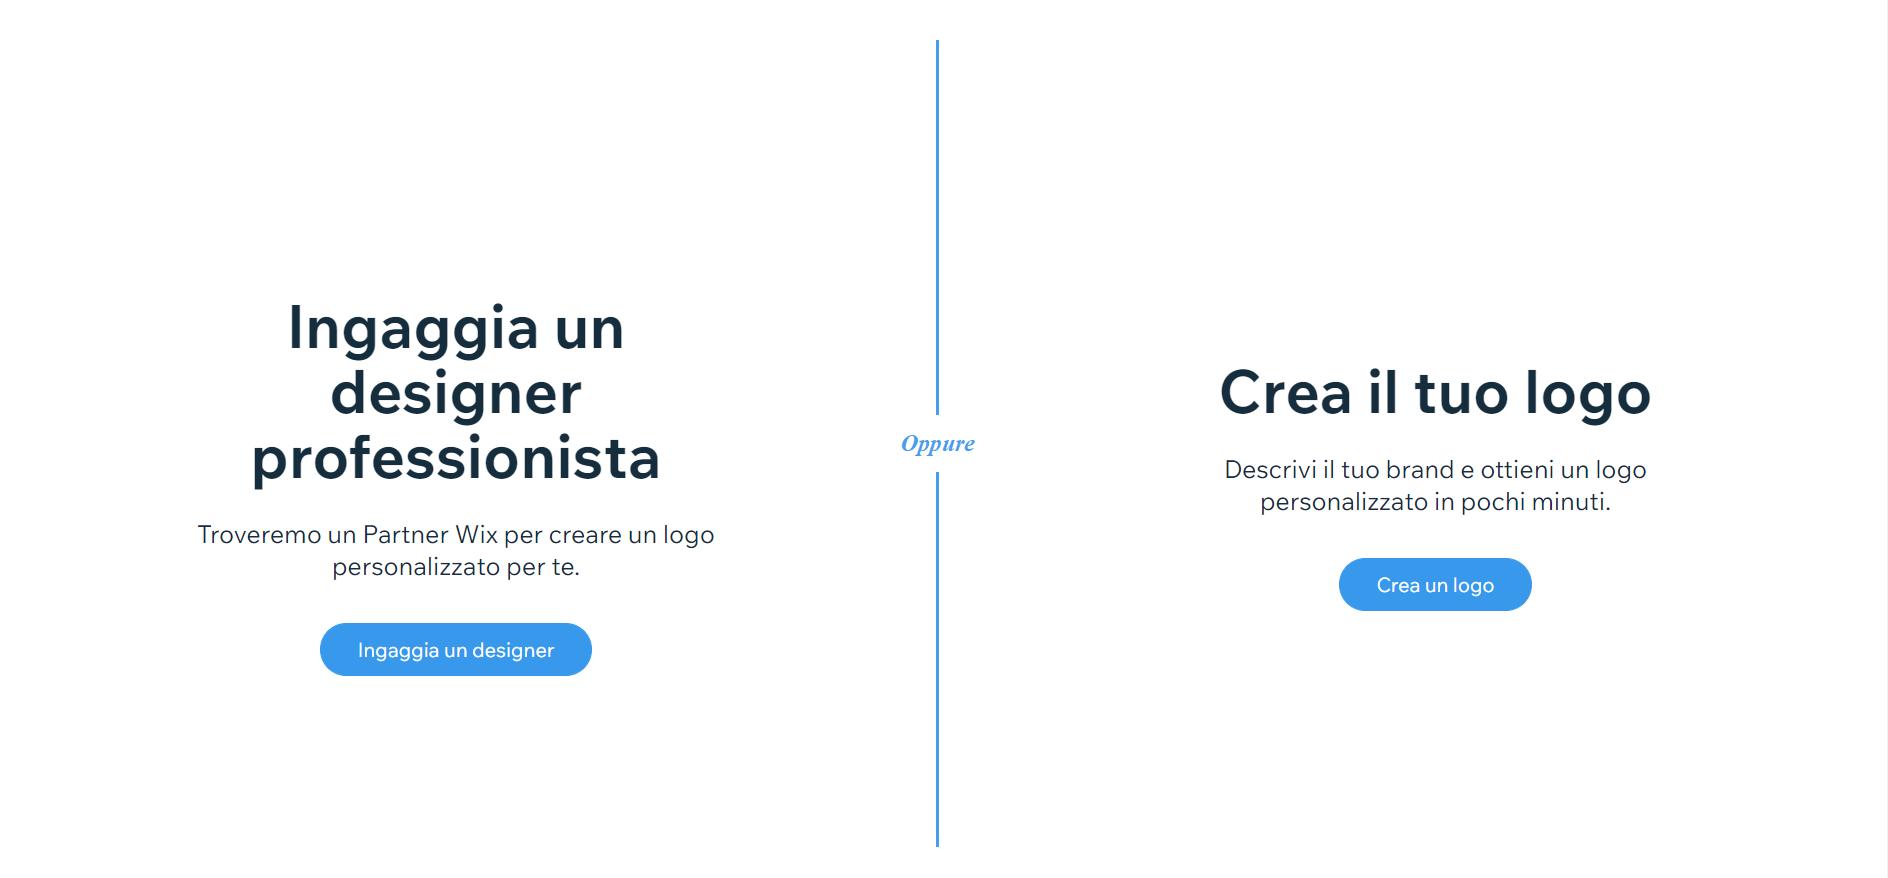 Creare un logo online gratis con Wix